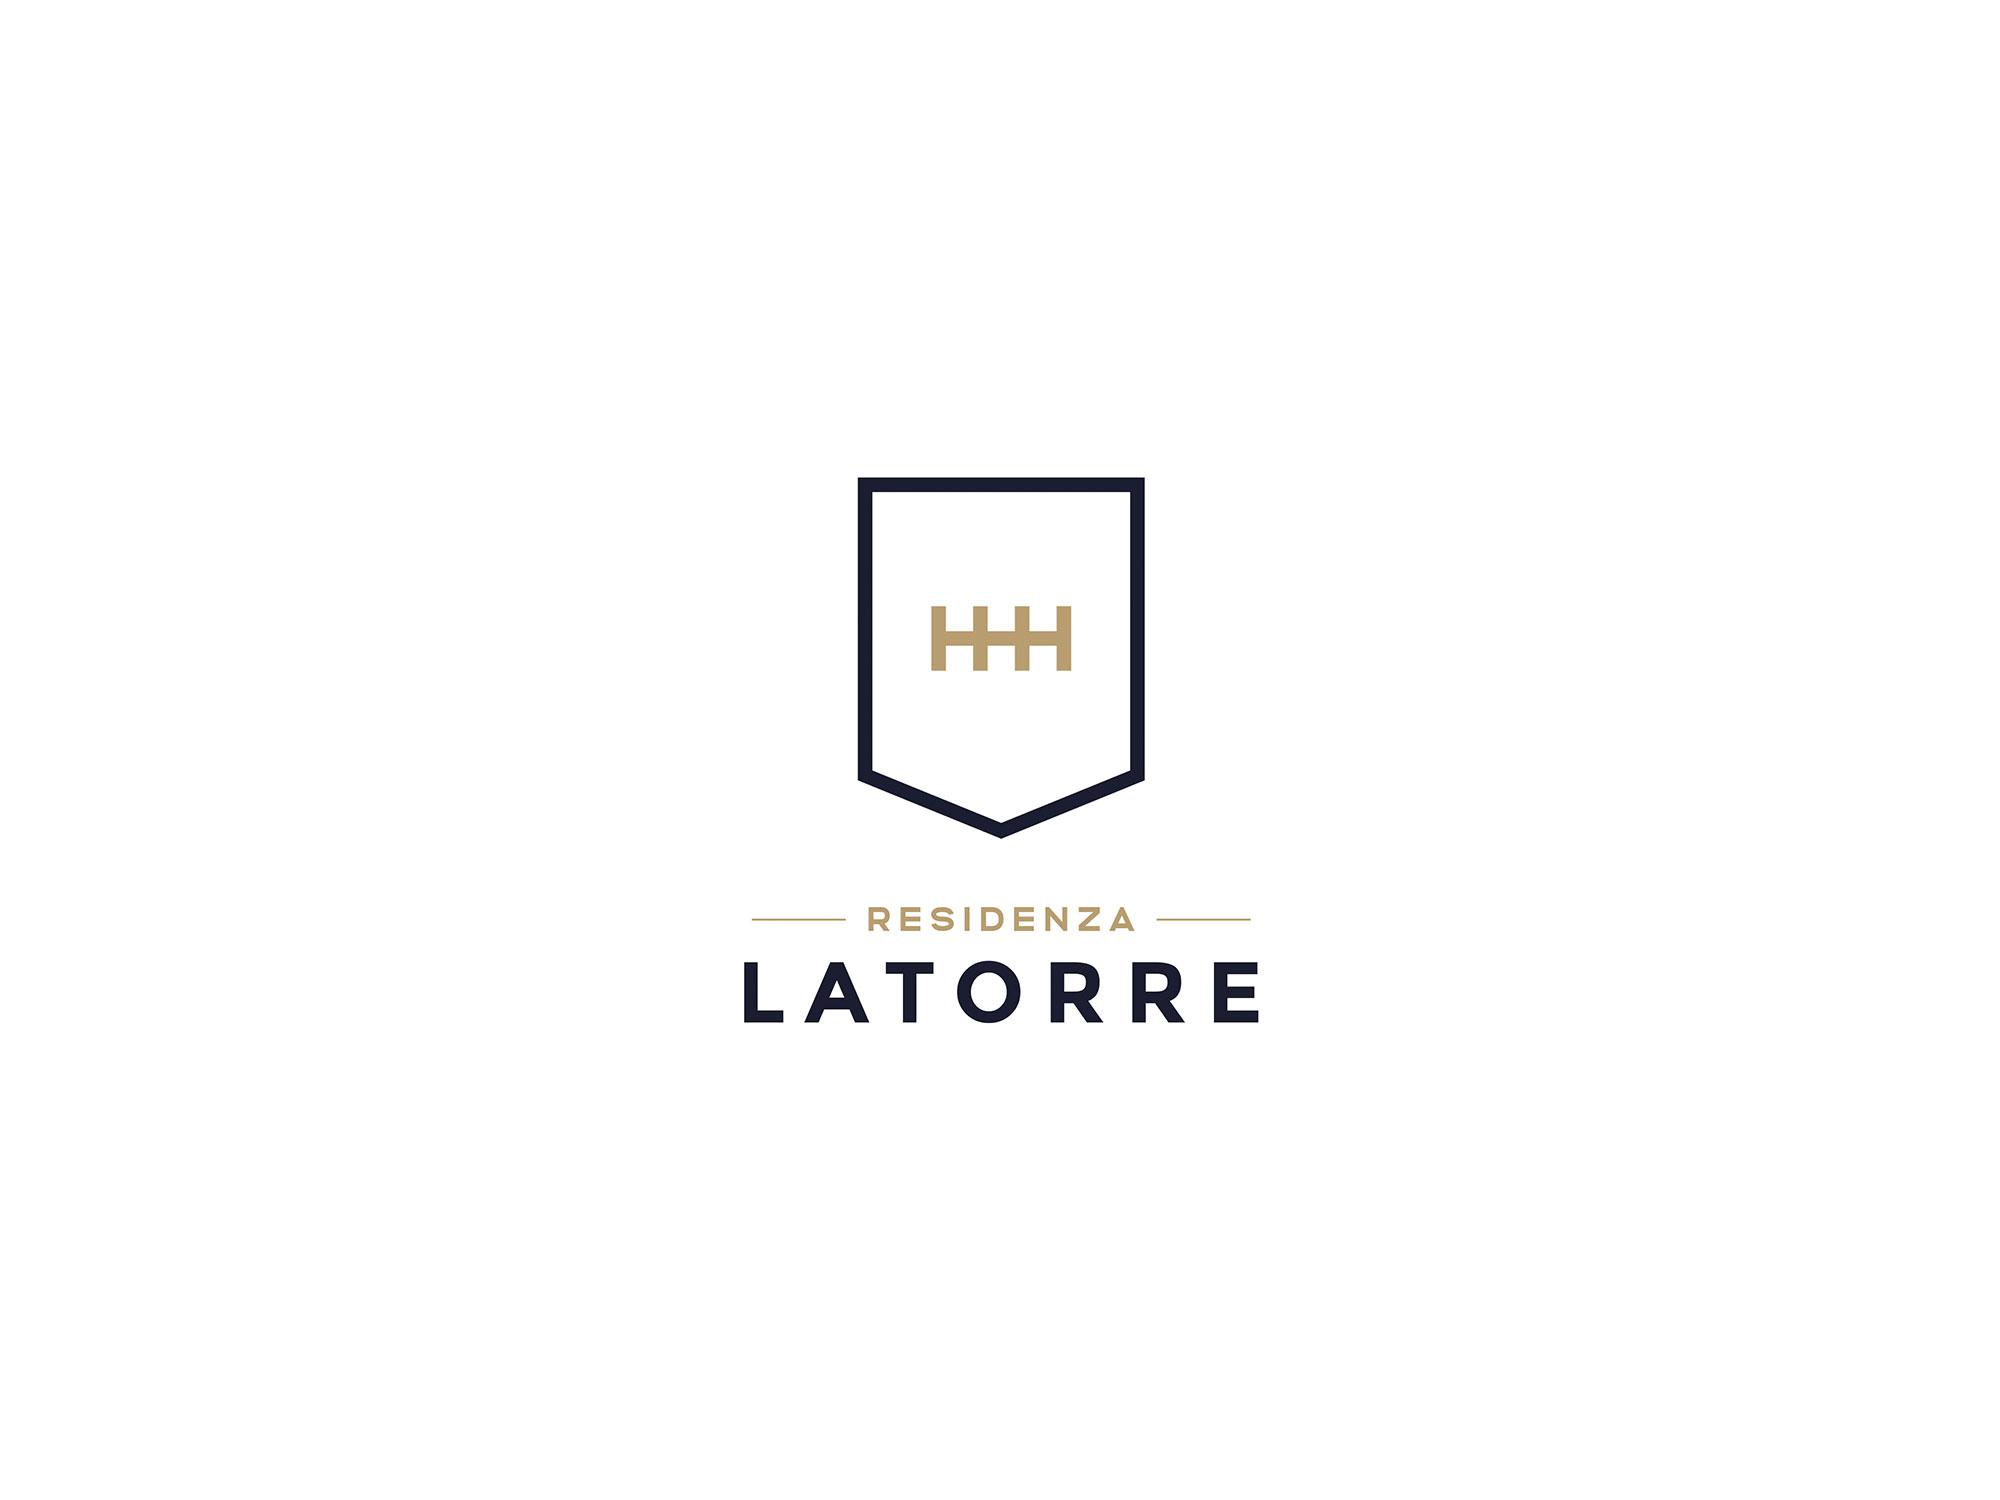 logo_latorre_def